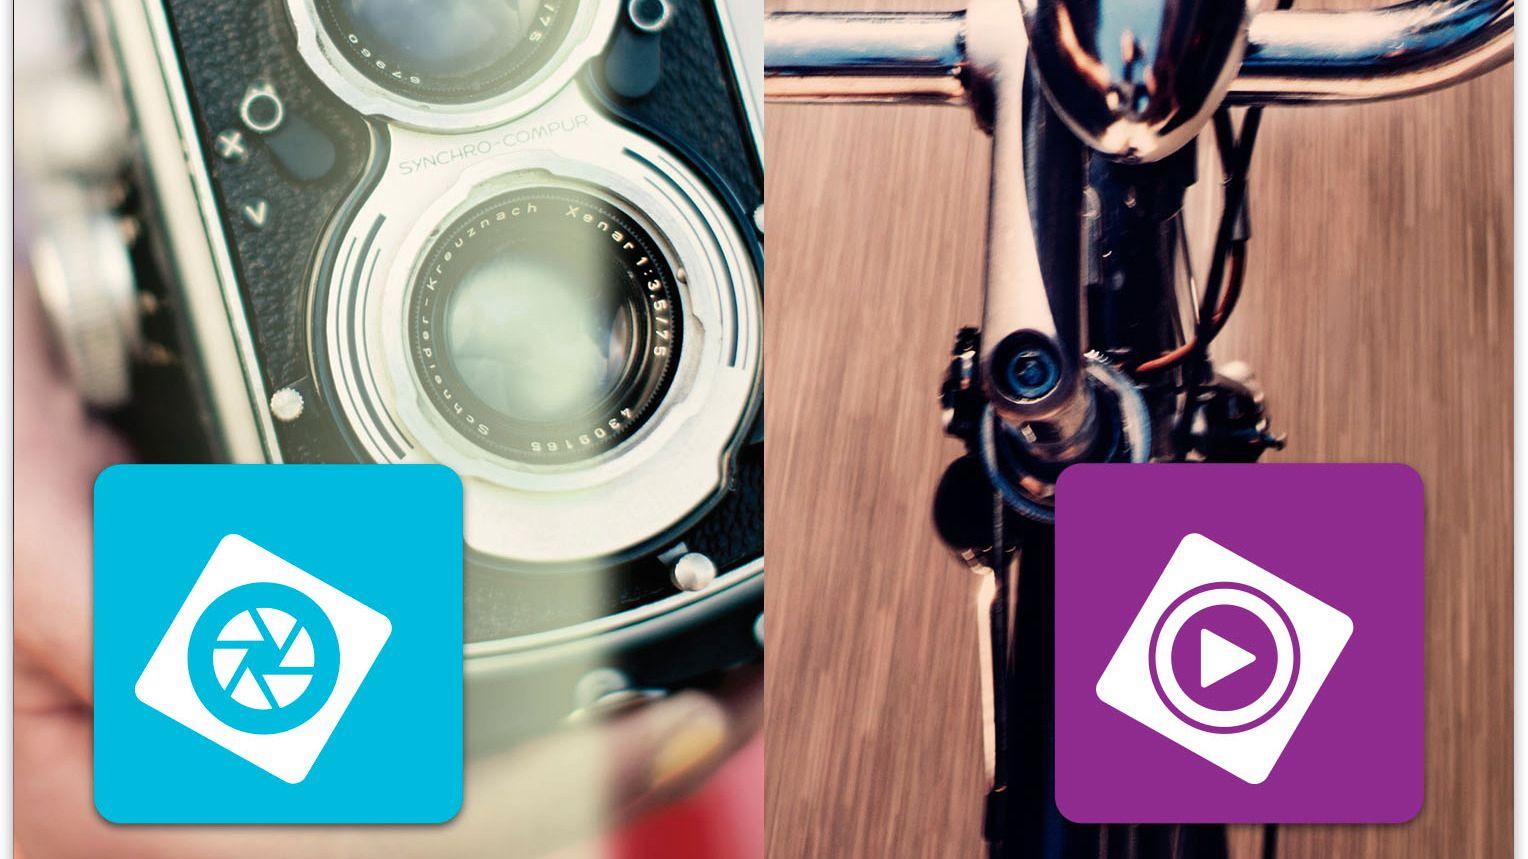 Adobe Elements 12 viser veien